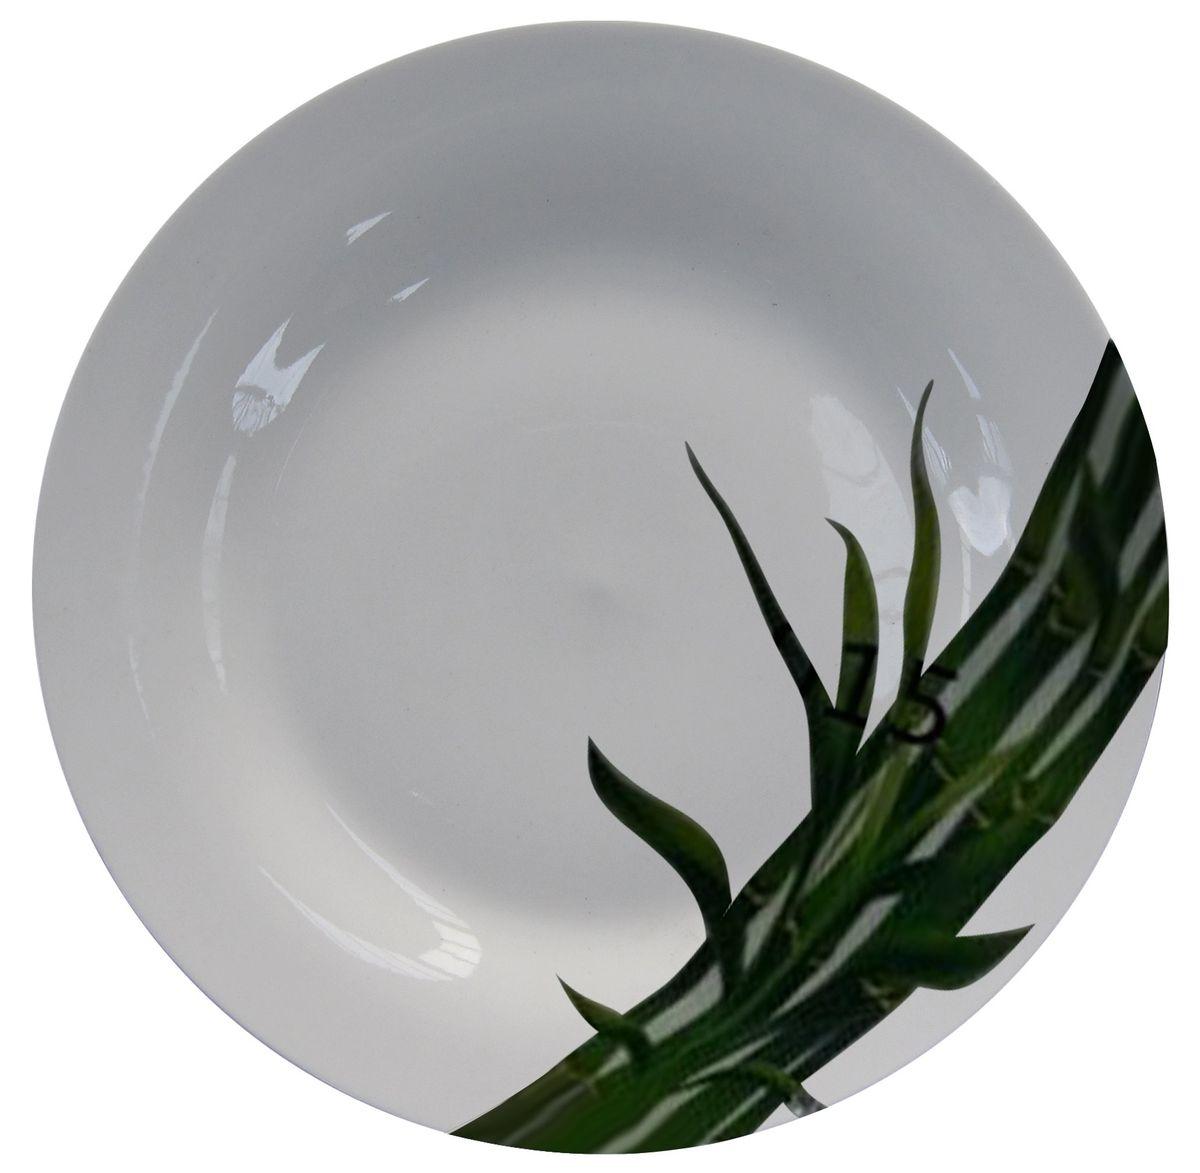 Тарелка МФК-профит Бамбук, 18 х 2,2 смMFK09016